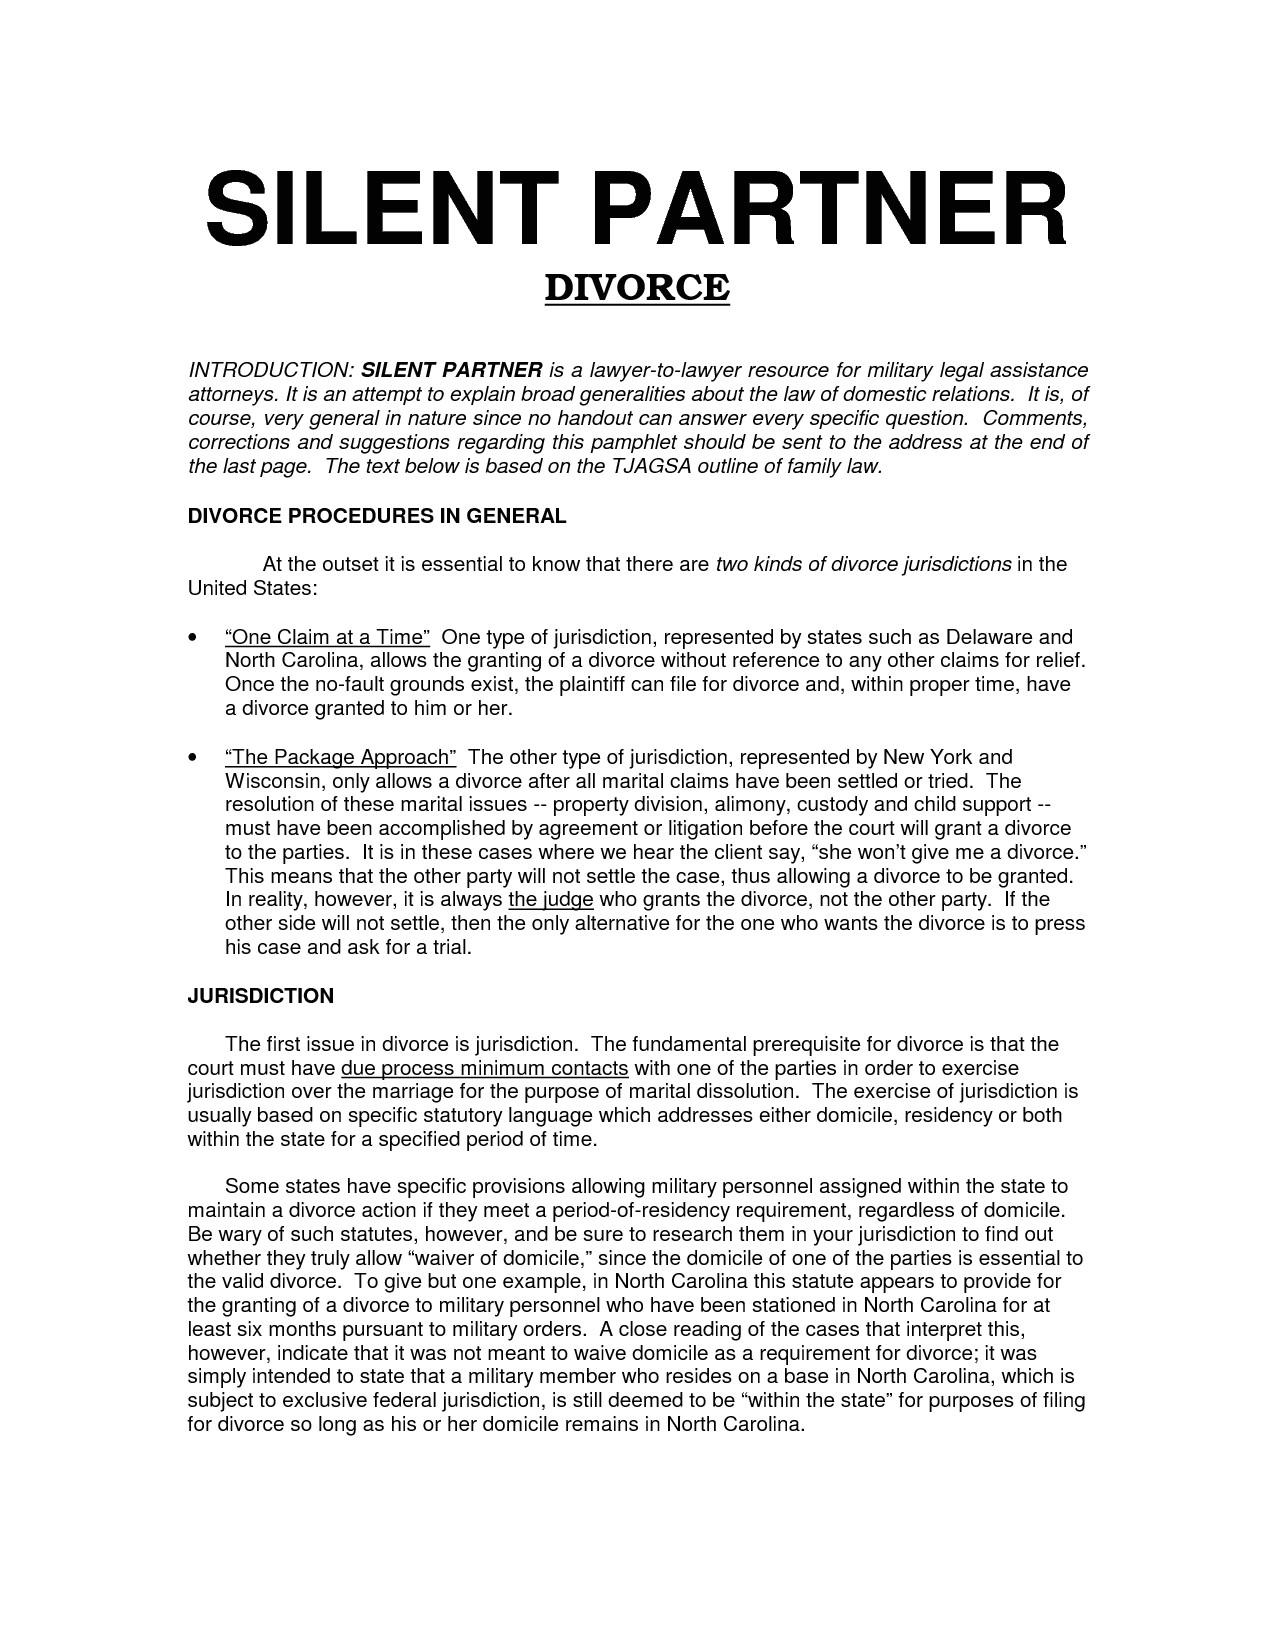 silent partnership agreement template perfect free silent partner agreement template 28 images lu r6726